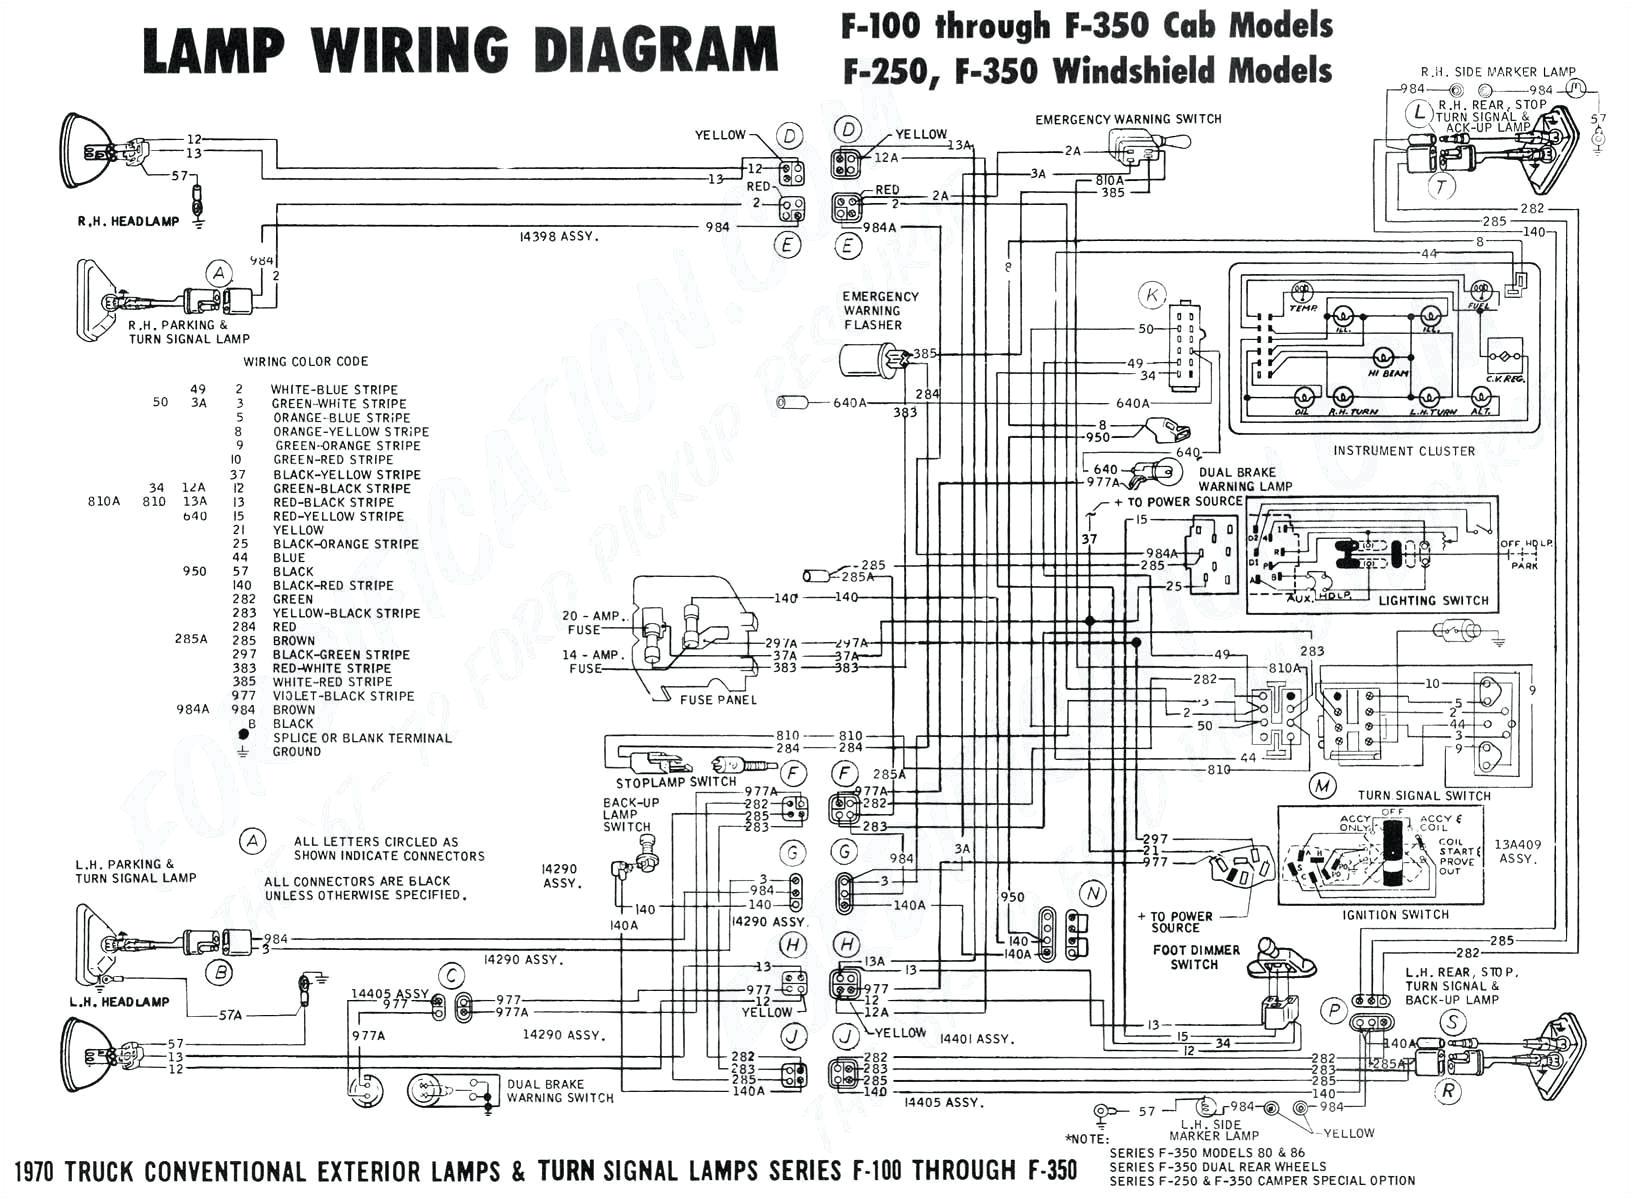 Lt1 Wiring Harness Diagram 93 Lt1 Wiring Diagram Wiring Diagram